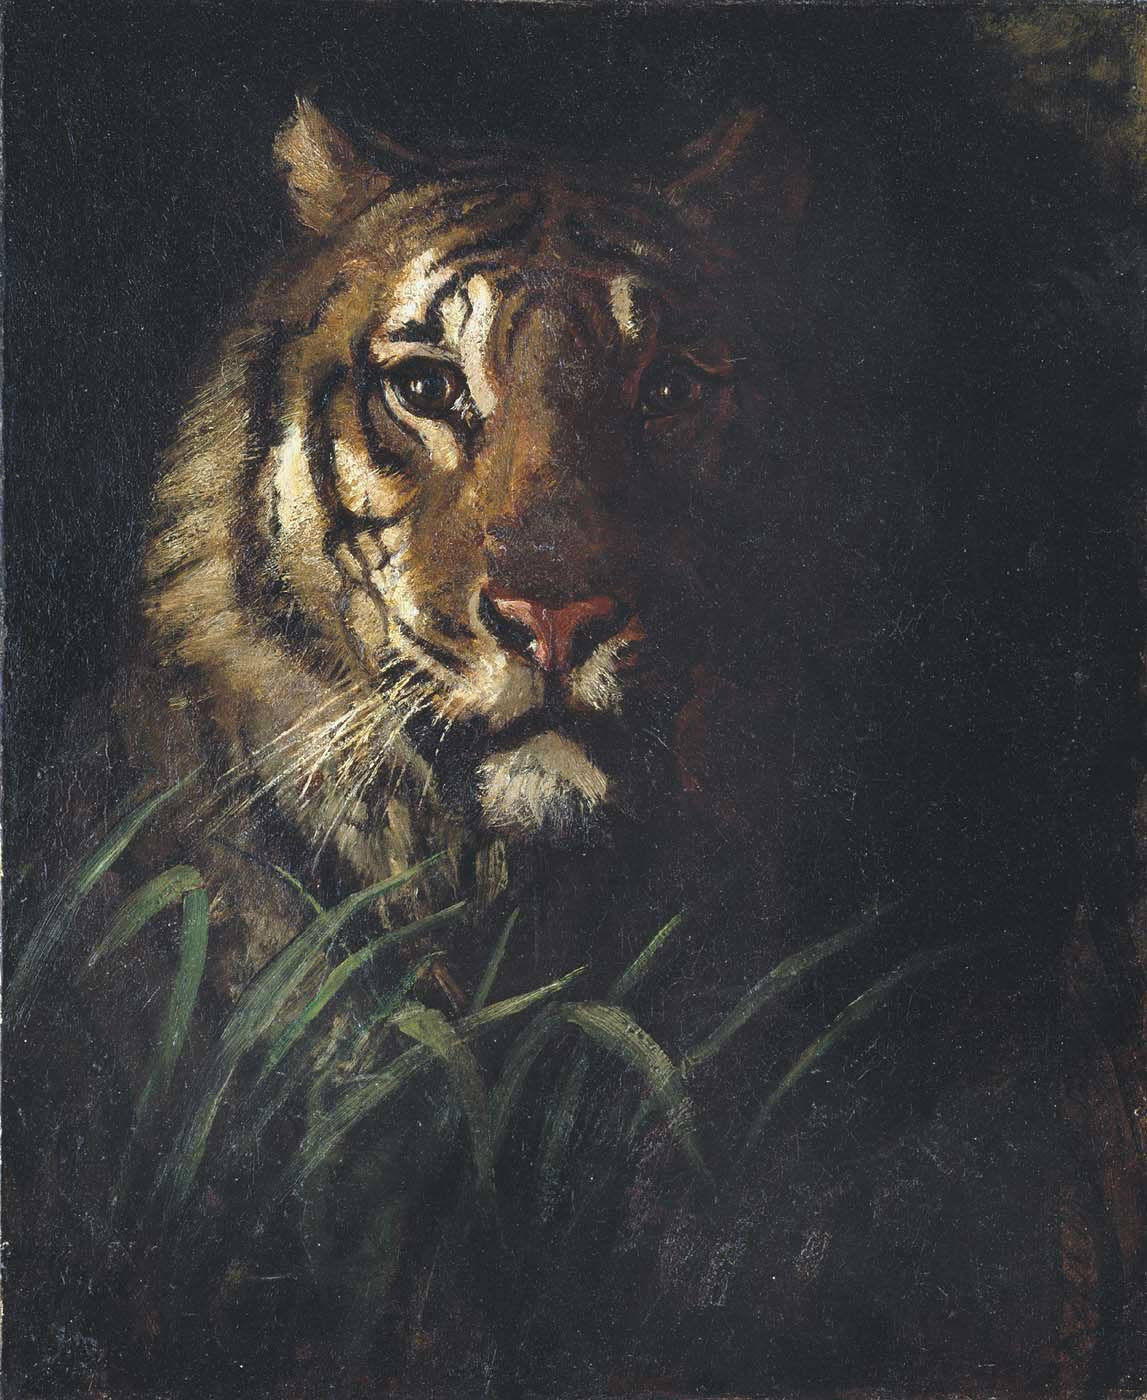 Abbott Handerson Thayer - Tiger's Head